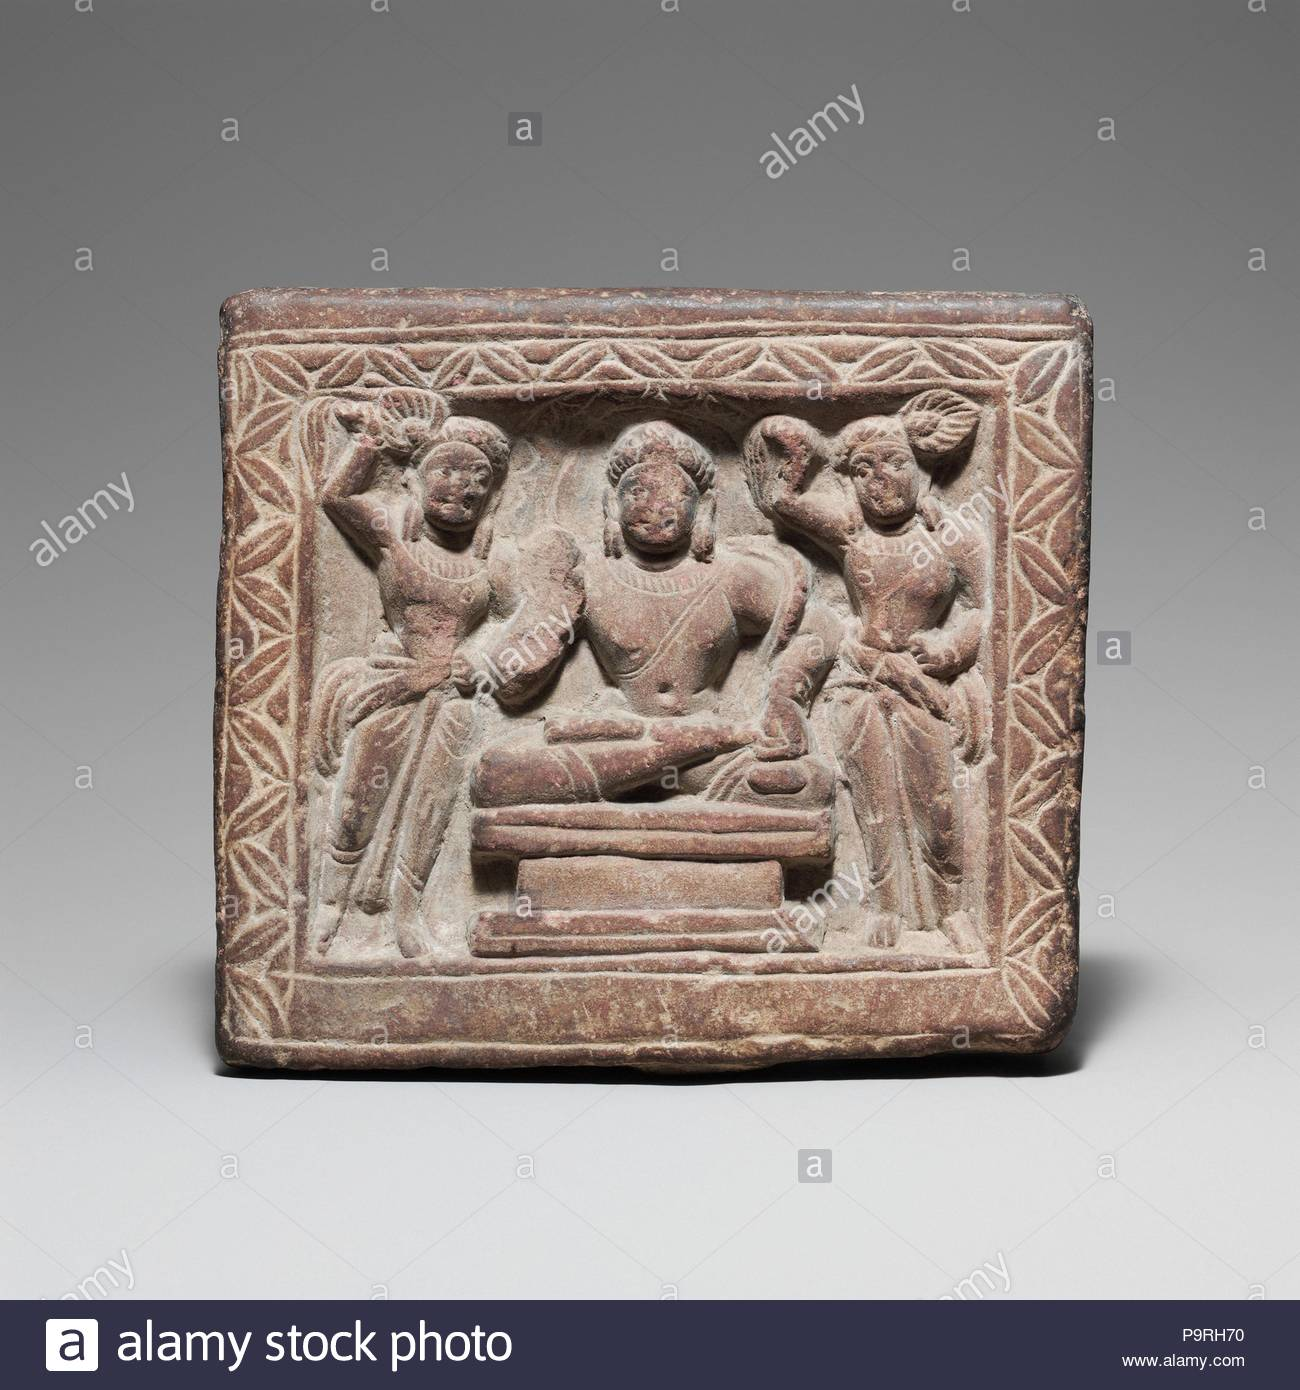 17 D Stock Photos Images Page 76 Alamy Helm Snail 315 Yellow Red Bodhisattva And Attendants 2nd3rd Century India Uttar Pradesh Mathura